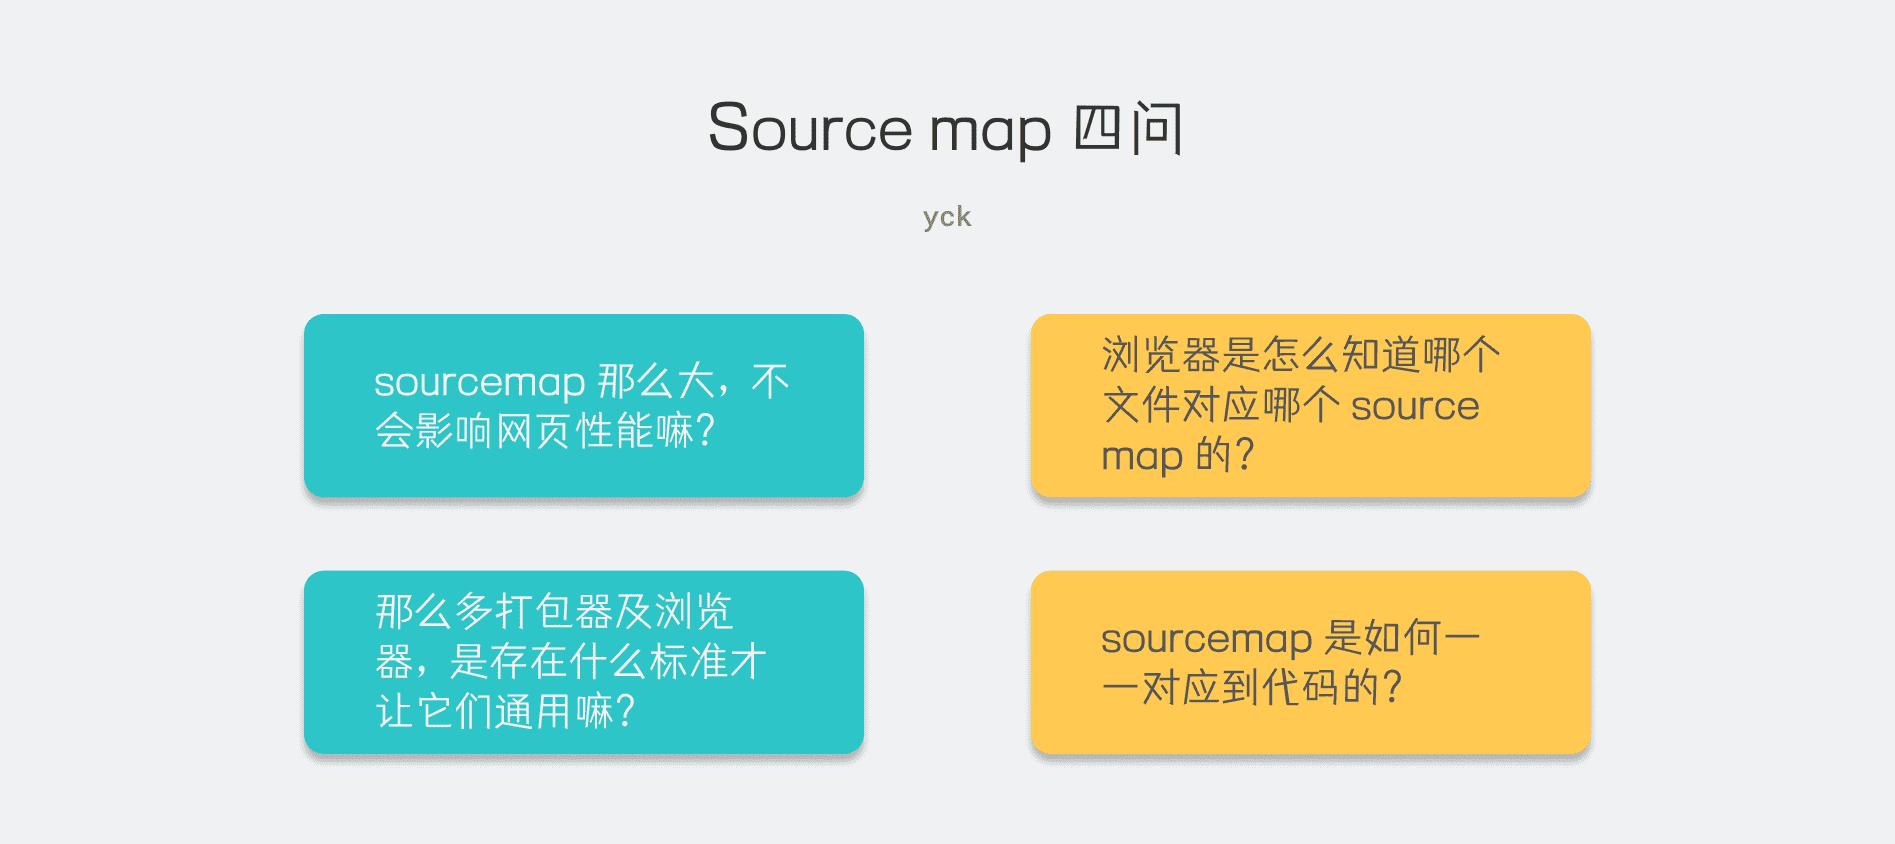 Source map 四问